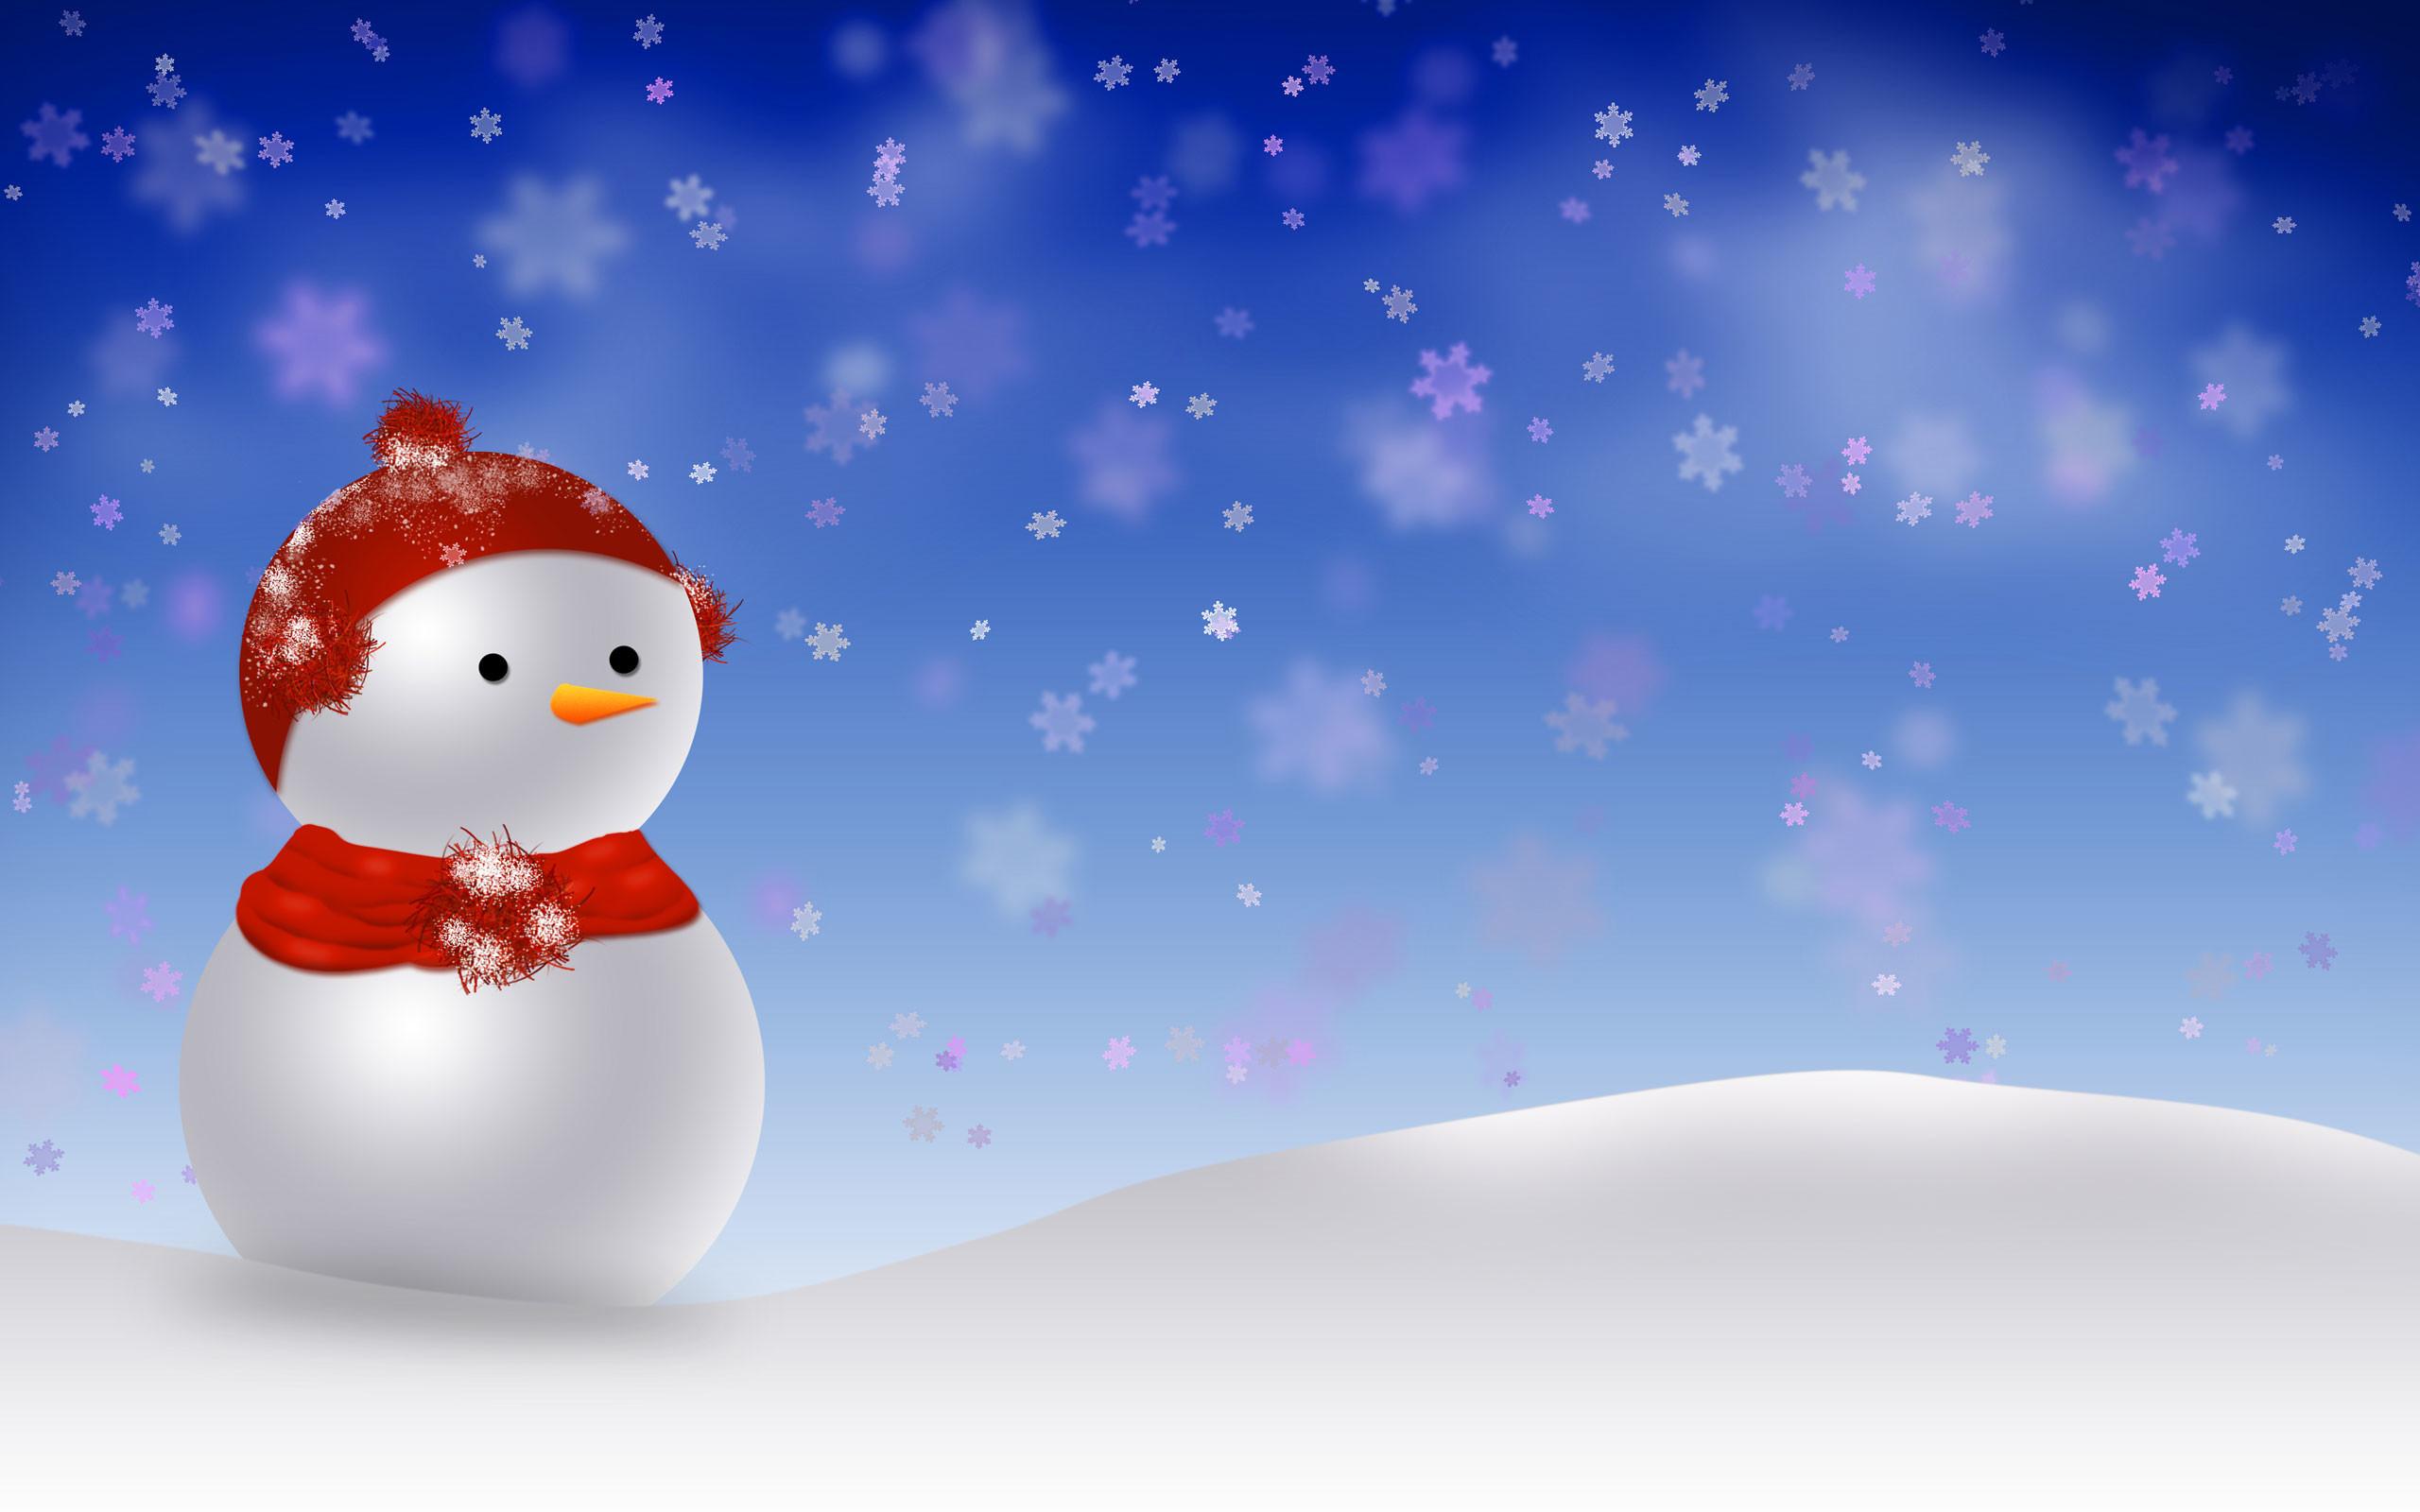 Free Cute Christmas Desktop Backgrounds | Desktop Wallpapers Wide .